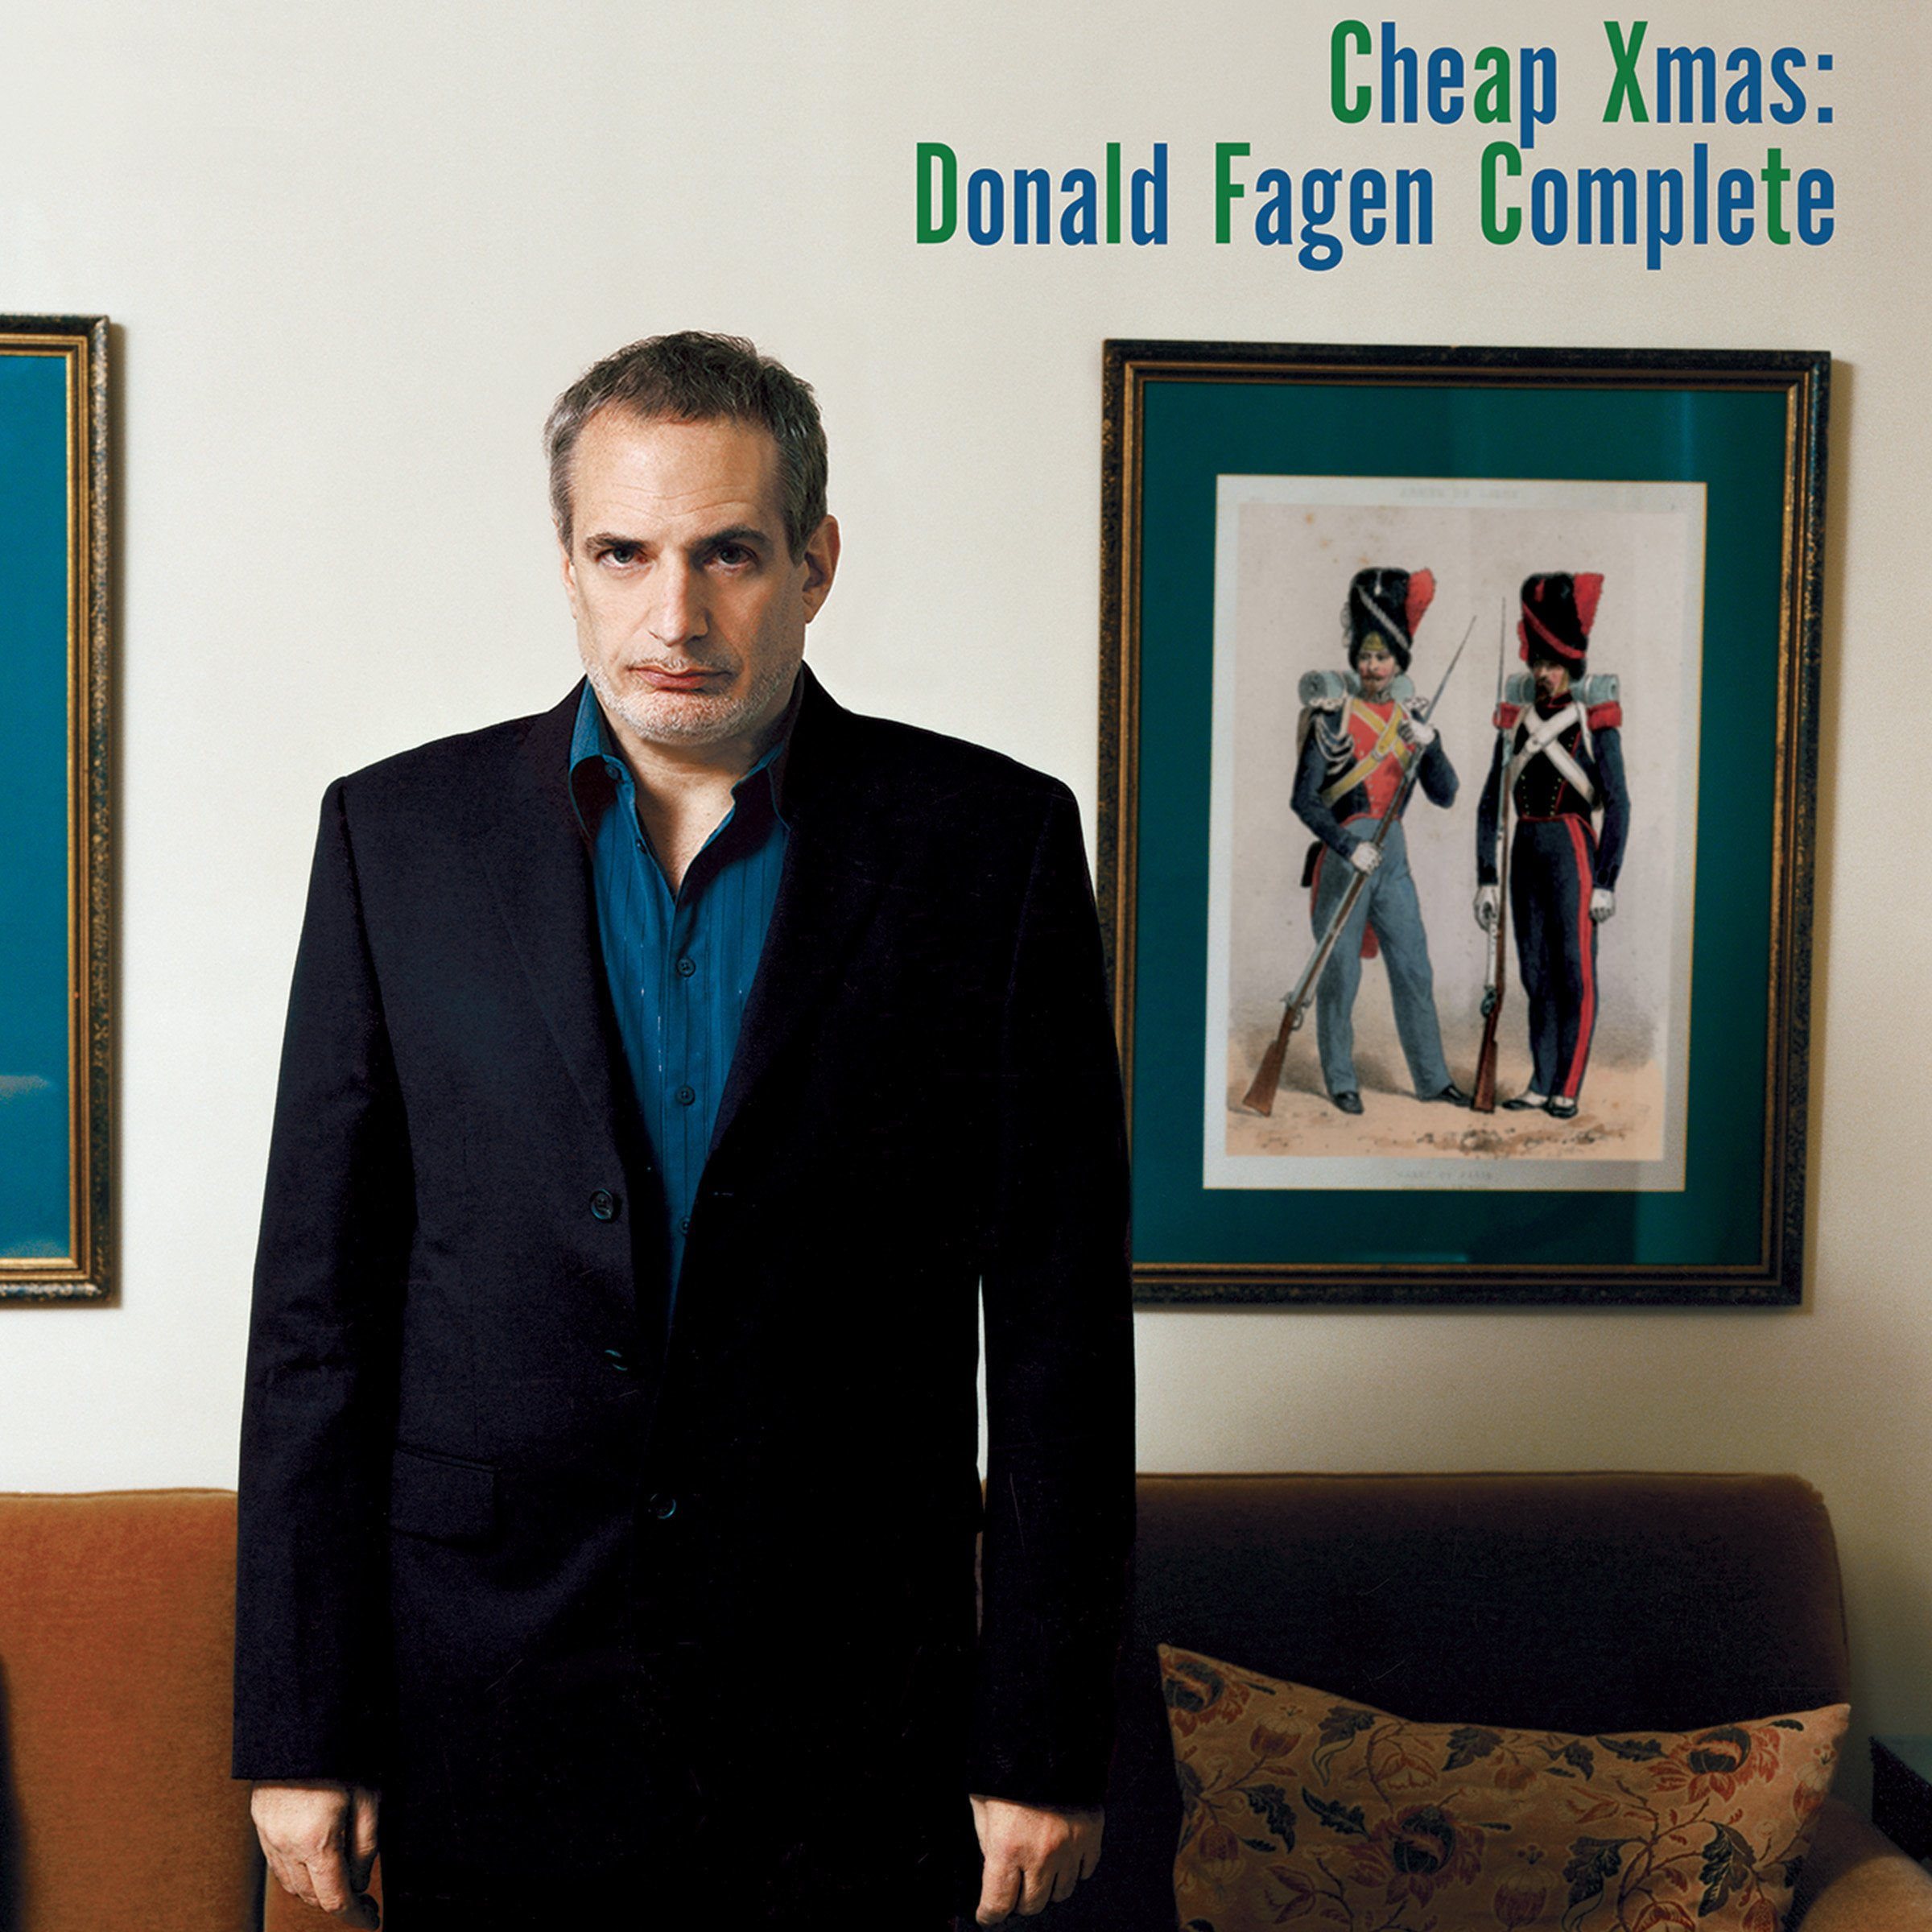 Cheap Xmas: Donald Fagen Complete (7LP 180 Gram Vinyl) by Rhino/Warner Bros.